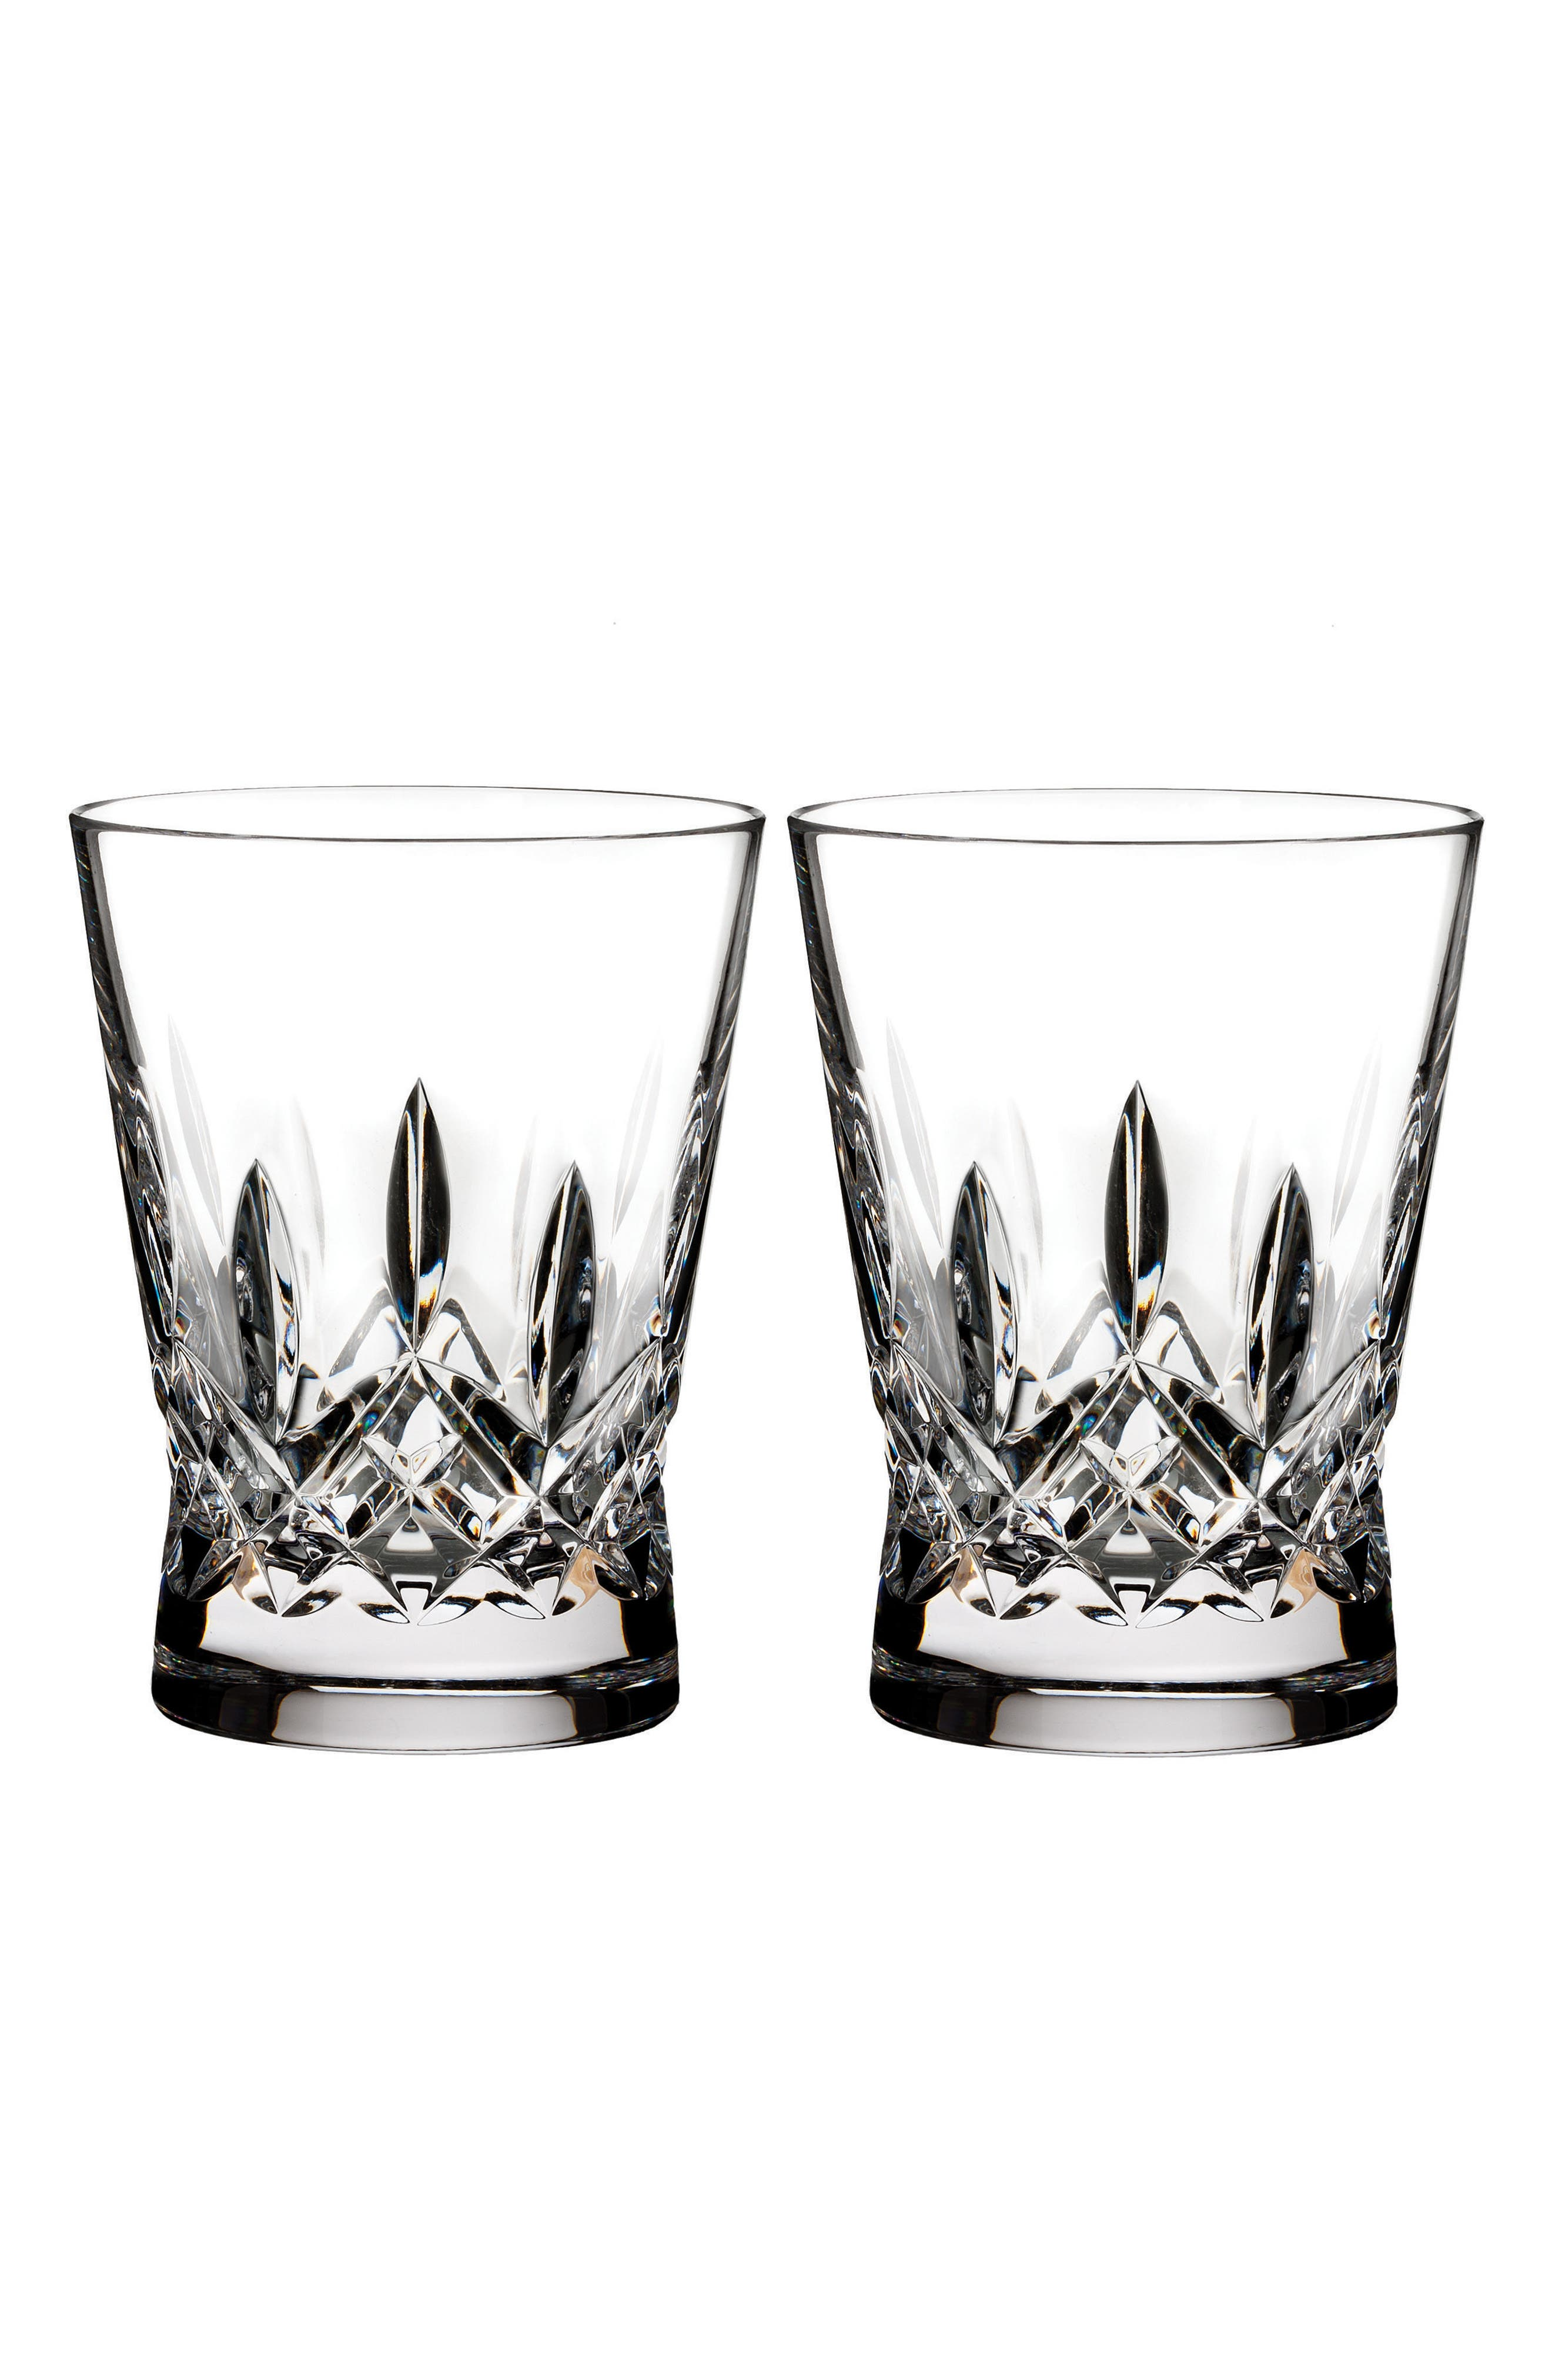 Lismore Pops Set of 2 Lead Crystal Old Fashioned Glasses,                         Main,                         color, Crystal